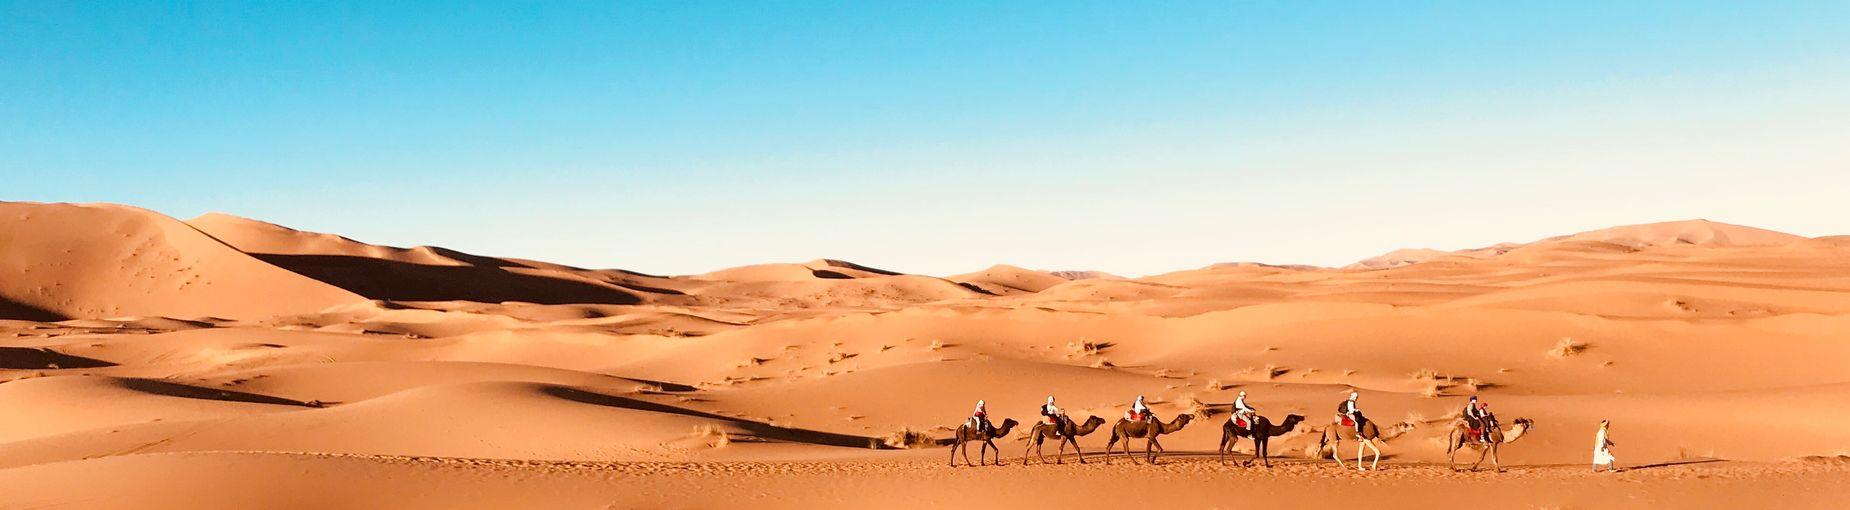 Sahara desert Morocco Desert Sand Dune Sand Arid Climate Clear Sky Camel Nature first eyeem photo